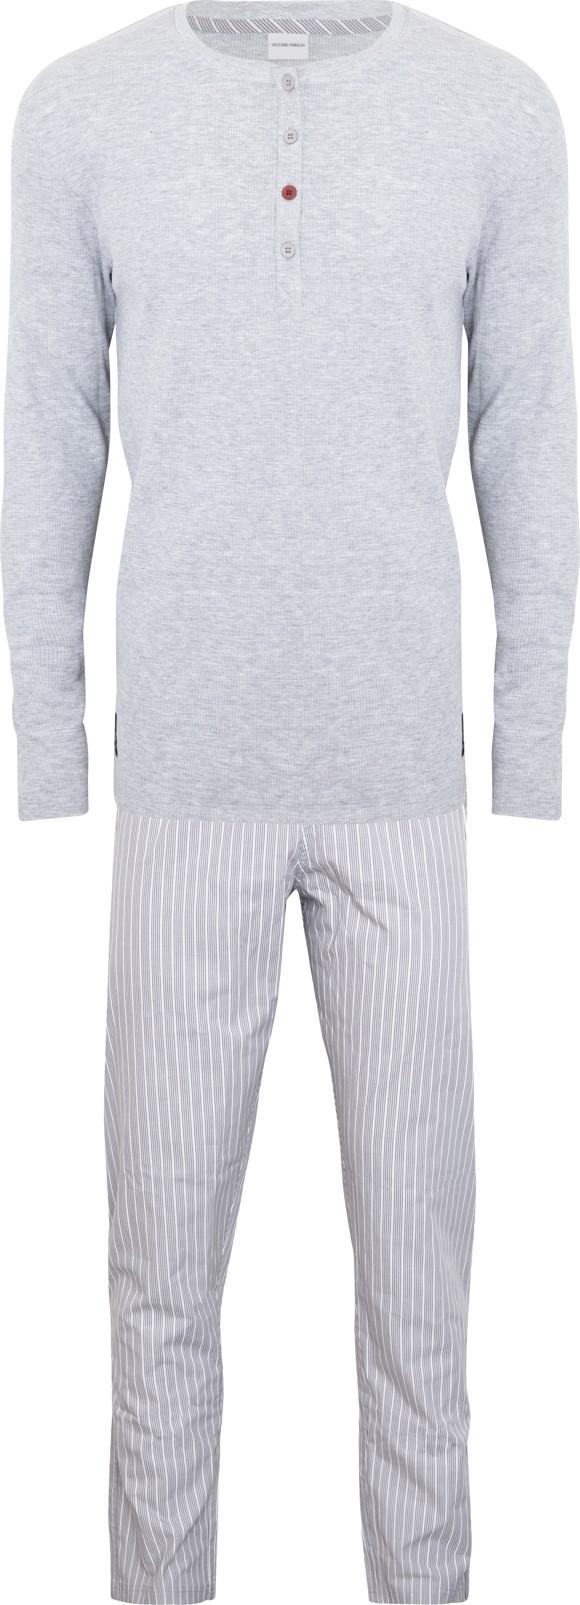 CR7  - Mens Pyjamas Set - Grey